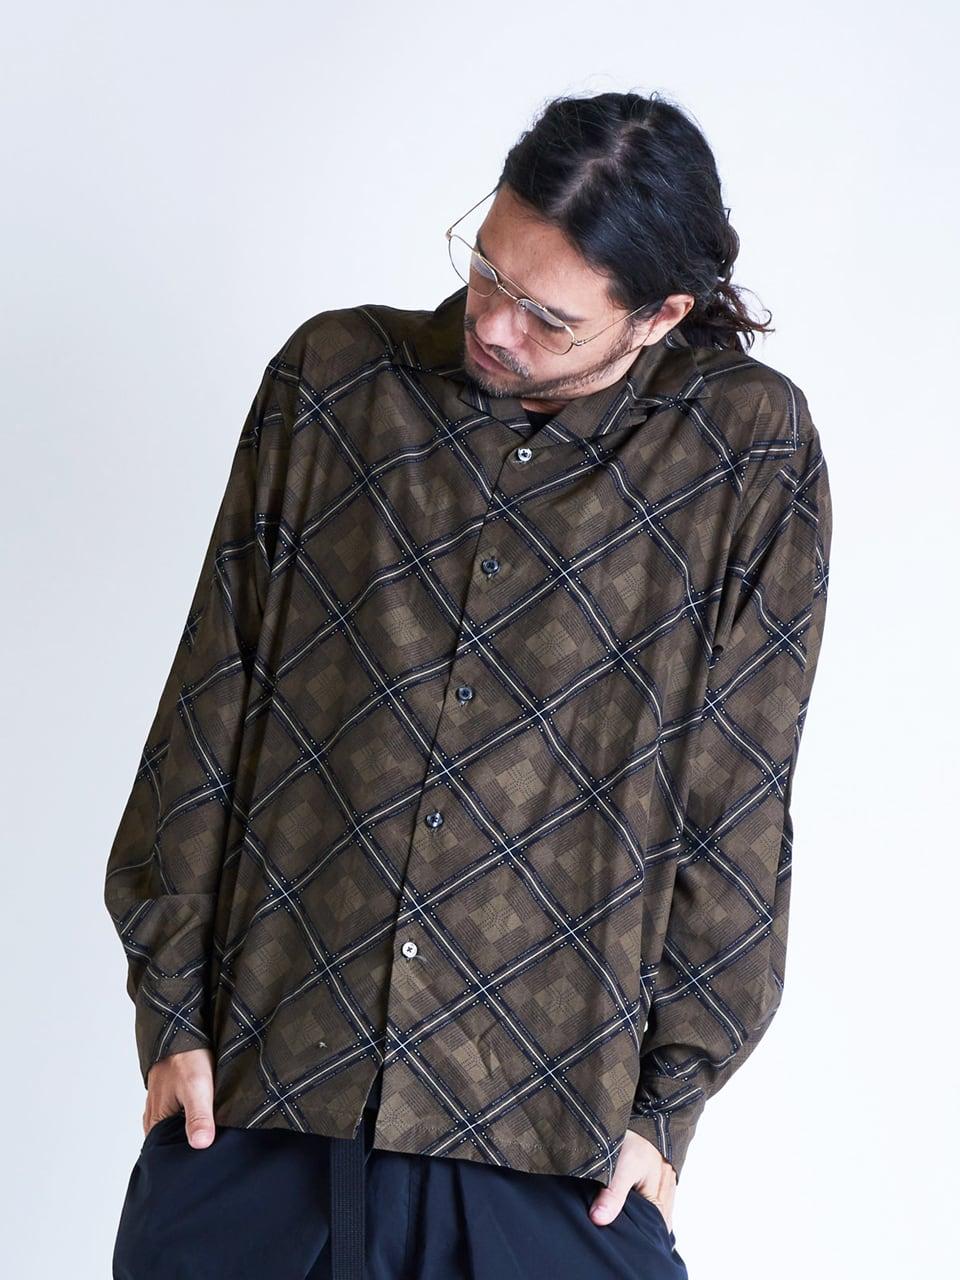 EGO TRIPPING (エゴトリッピング) RHOMBUS PATTERNED SHIRTS ロンバスパターンシャツ / BEIGE 613815-31